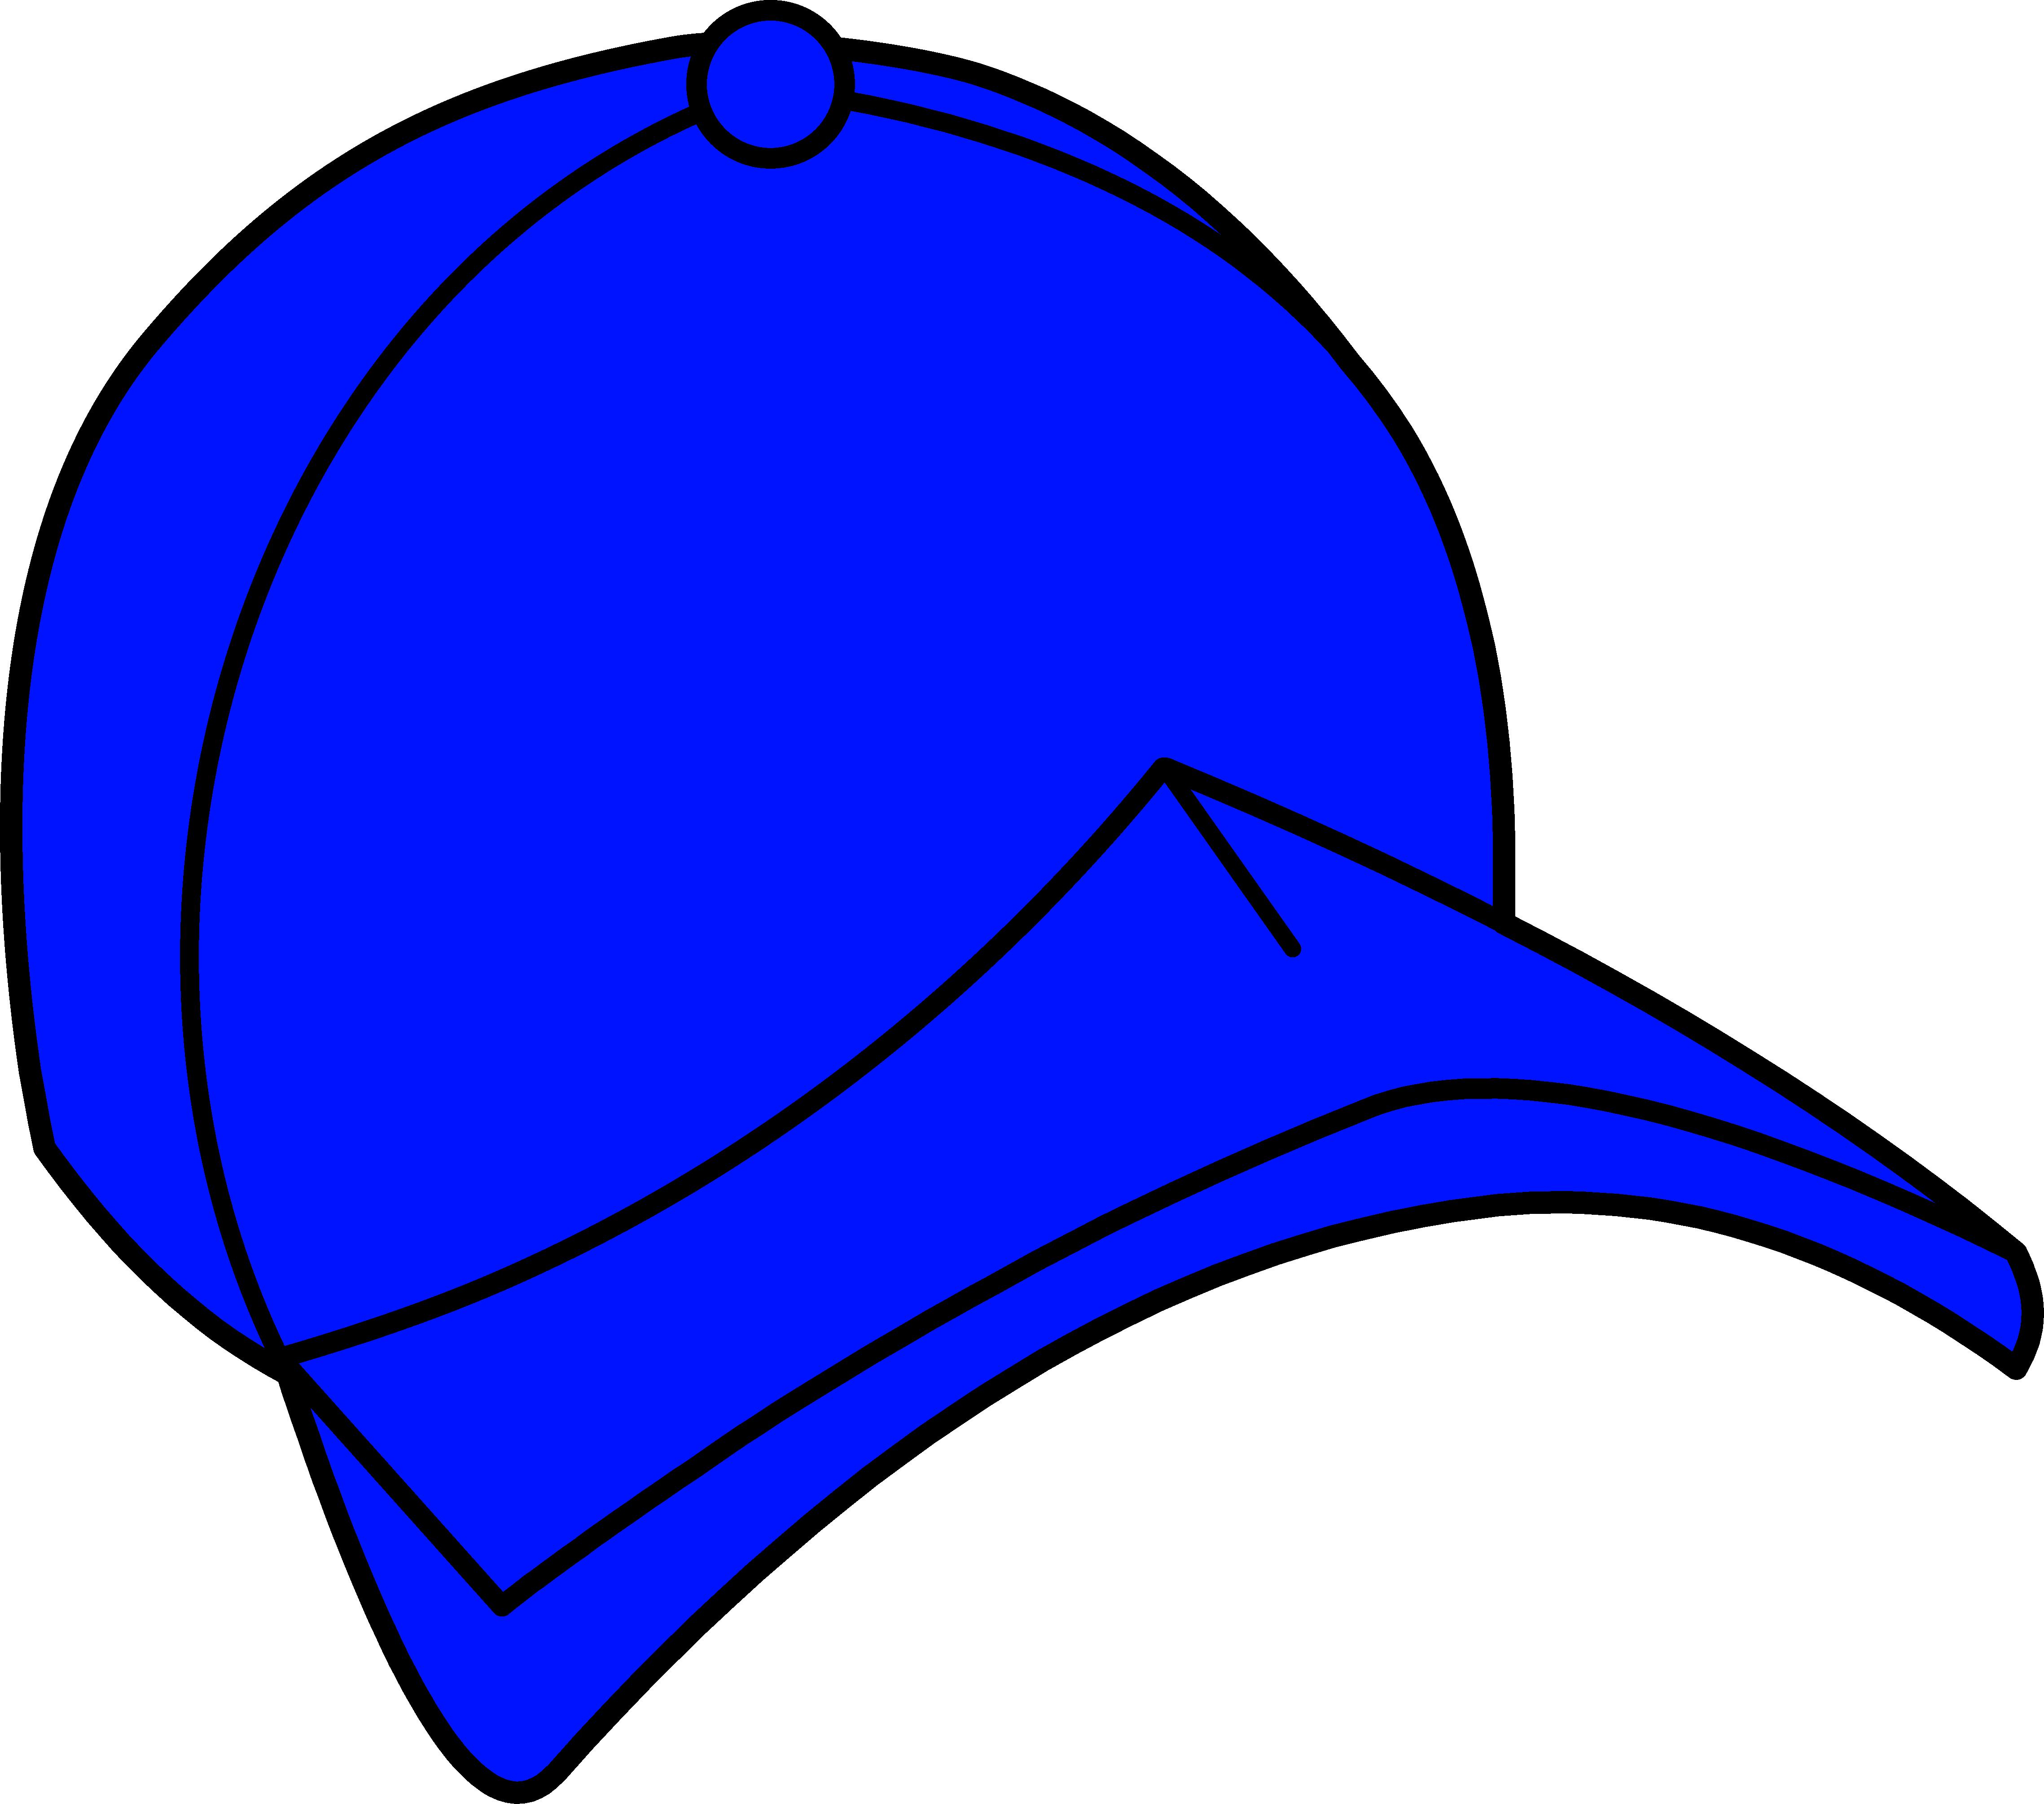 Blue Clipart.